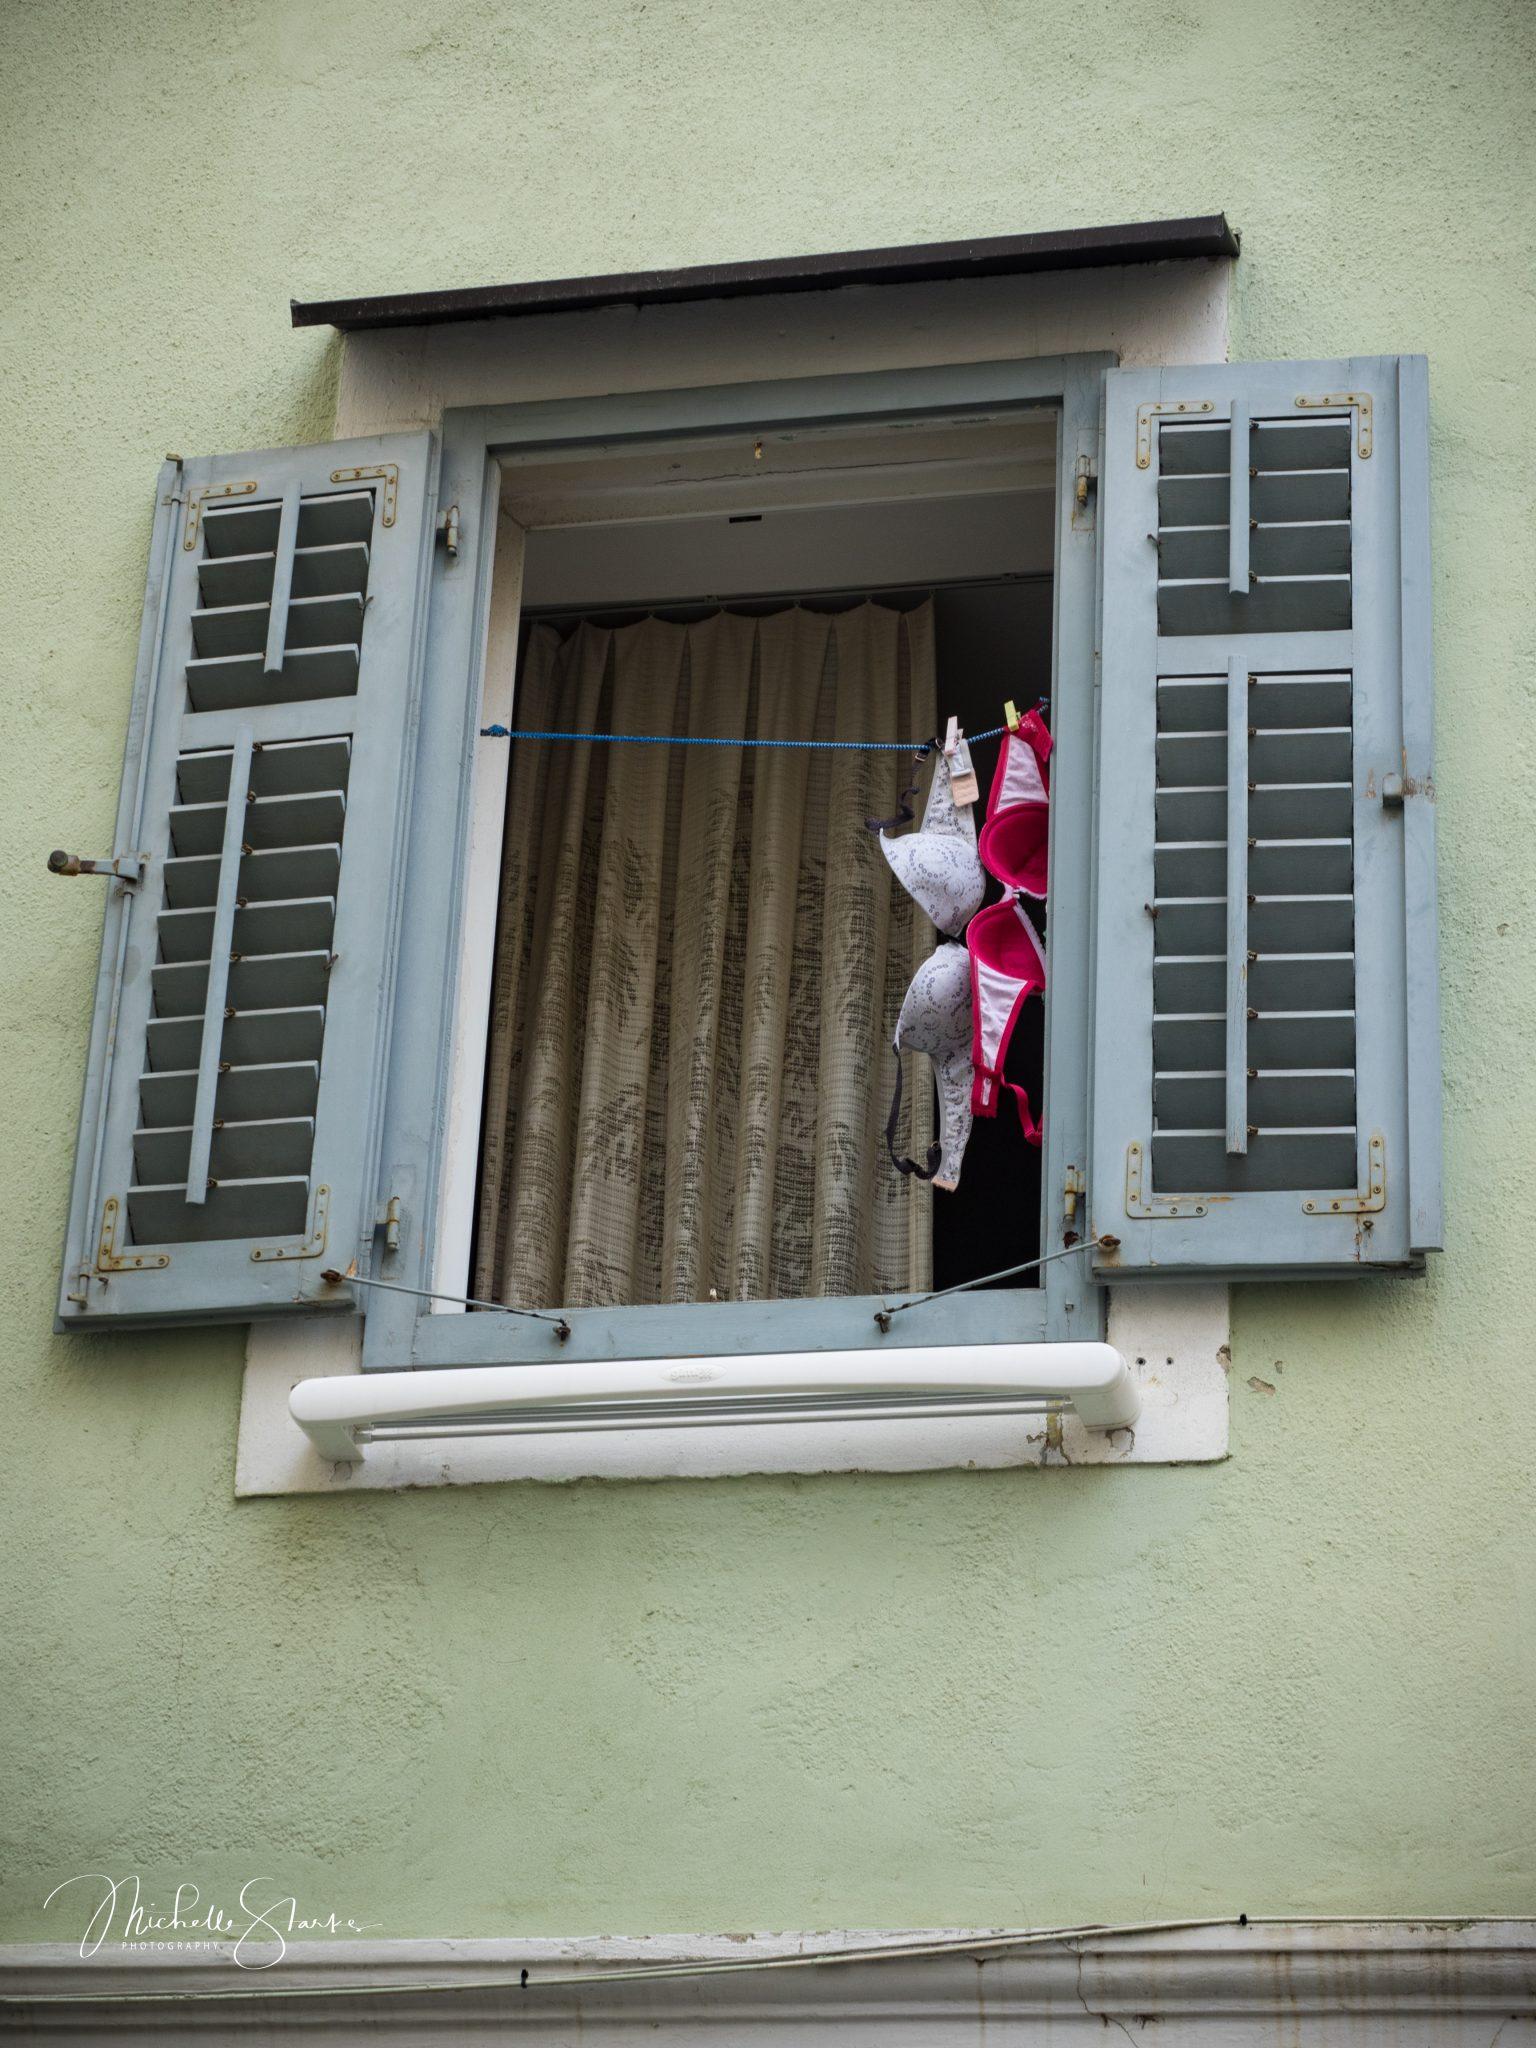 Laundry Day II, Piran, Slovenia